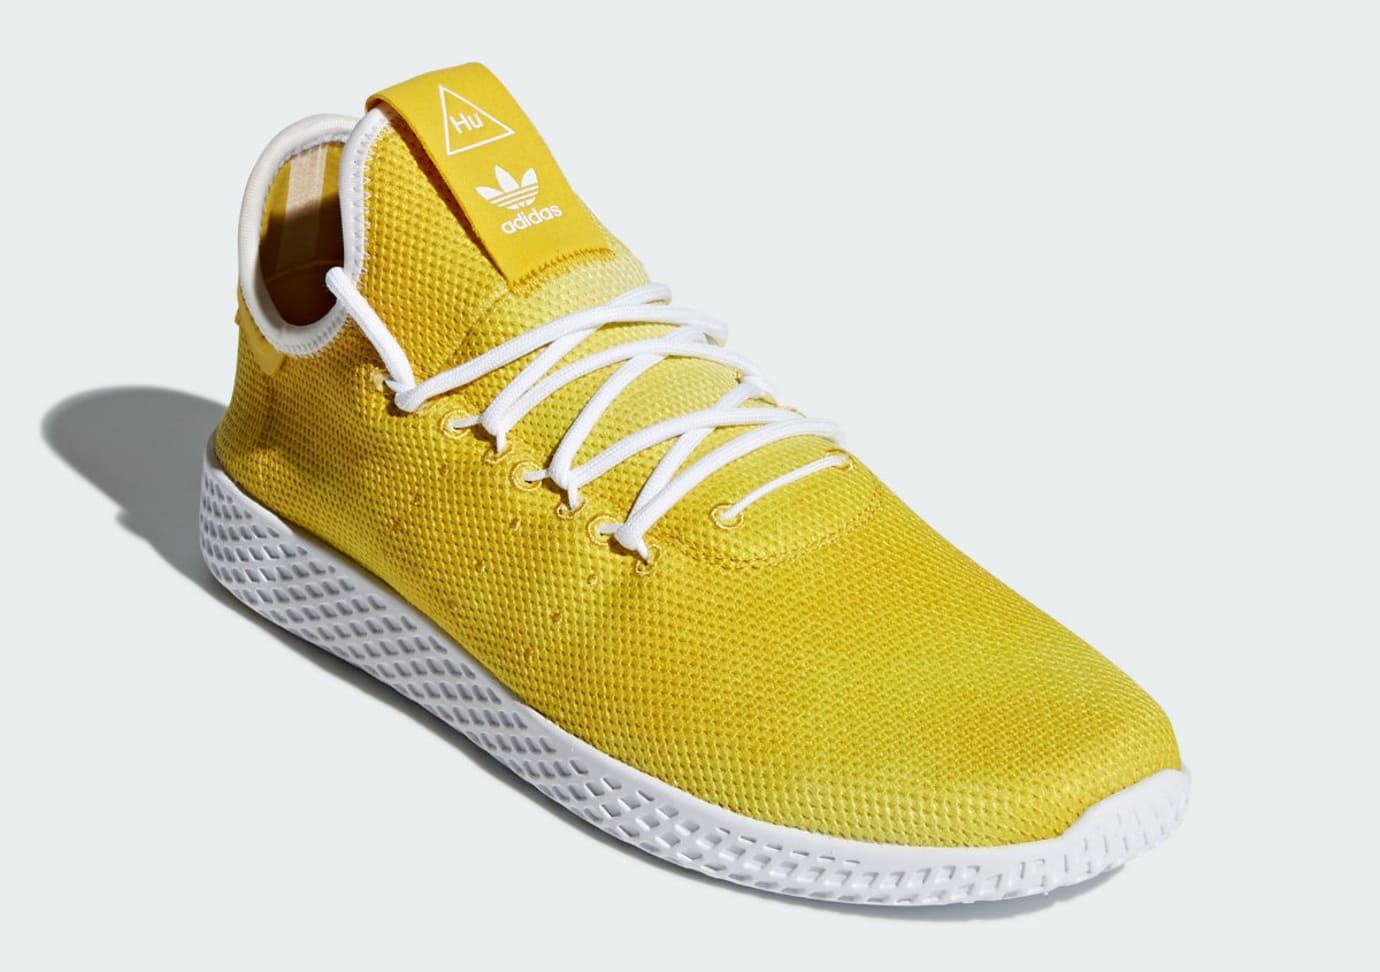 c2cfa1726499b Pharrell x Adidas Tennis Hu Holi Bright Yellow Release Date DA9617 Front